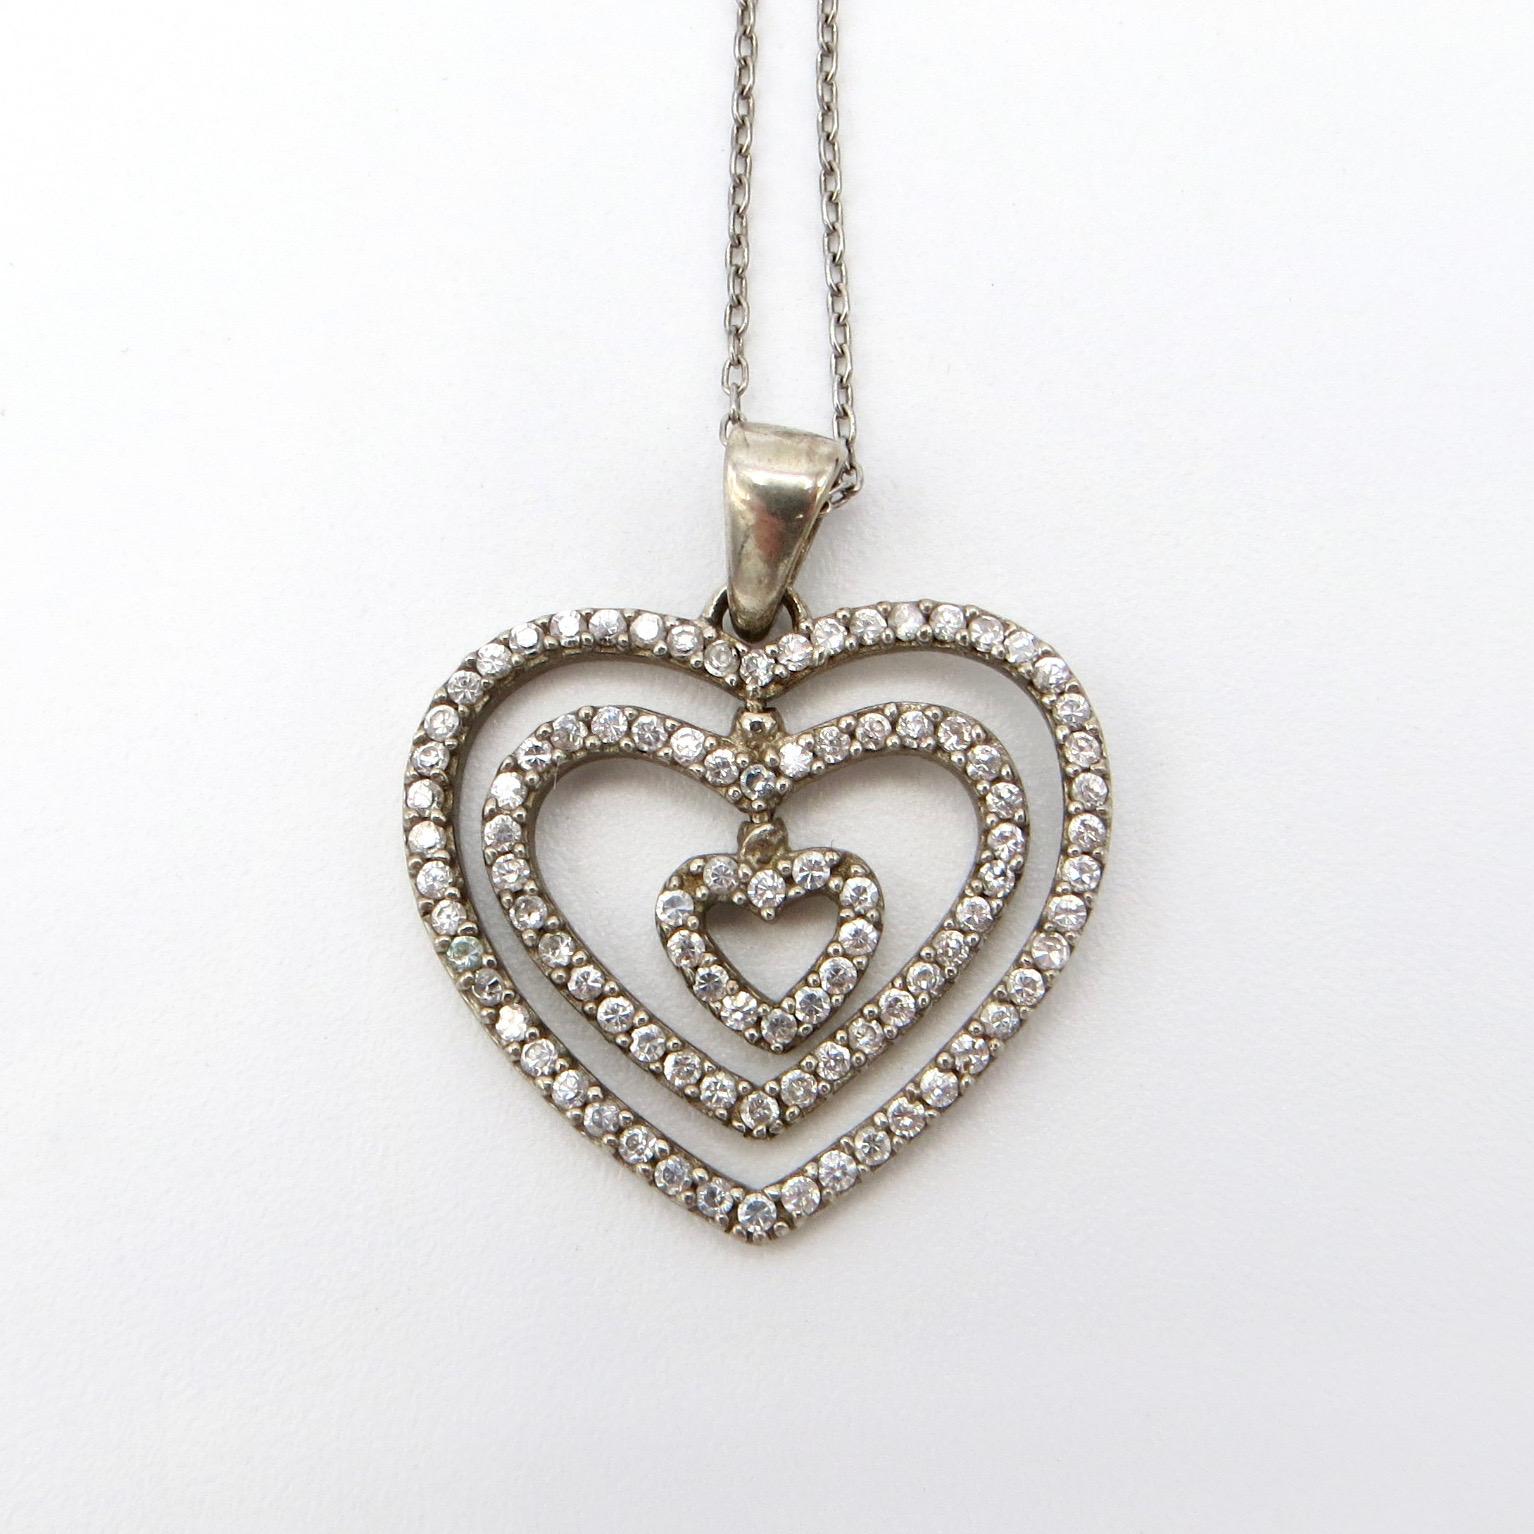 Silver & Crystal Heart Pendant